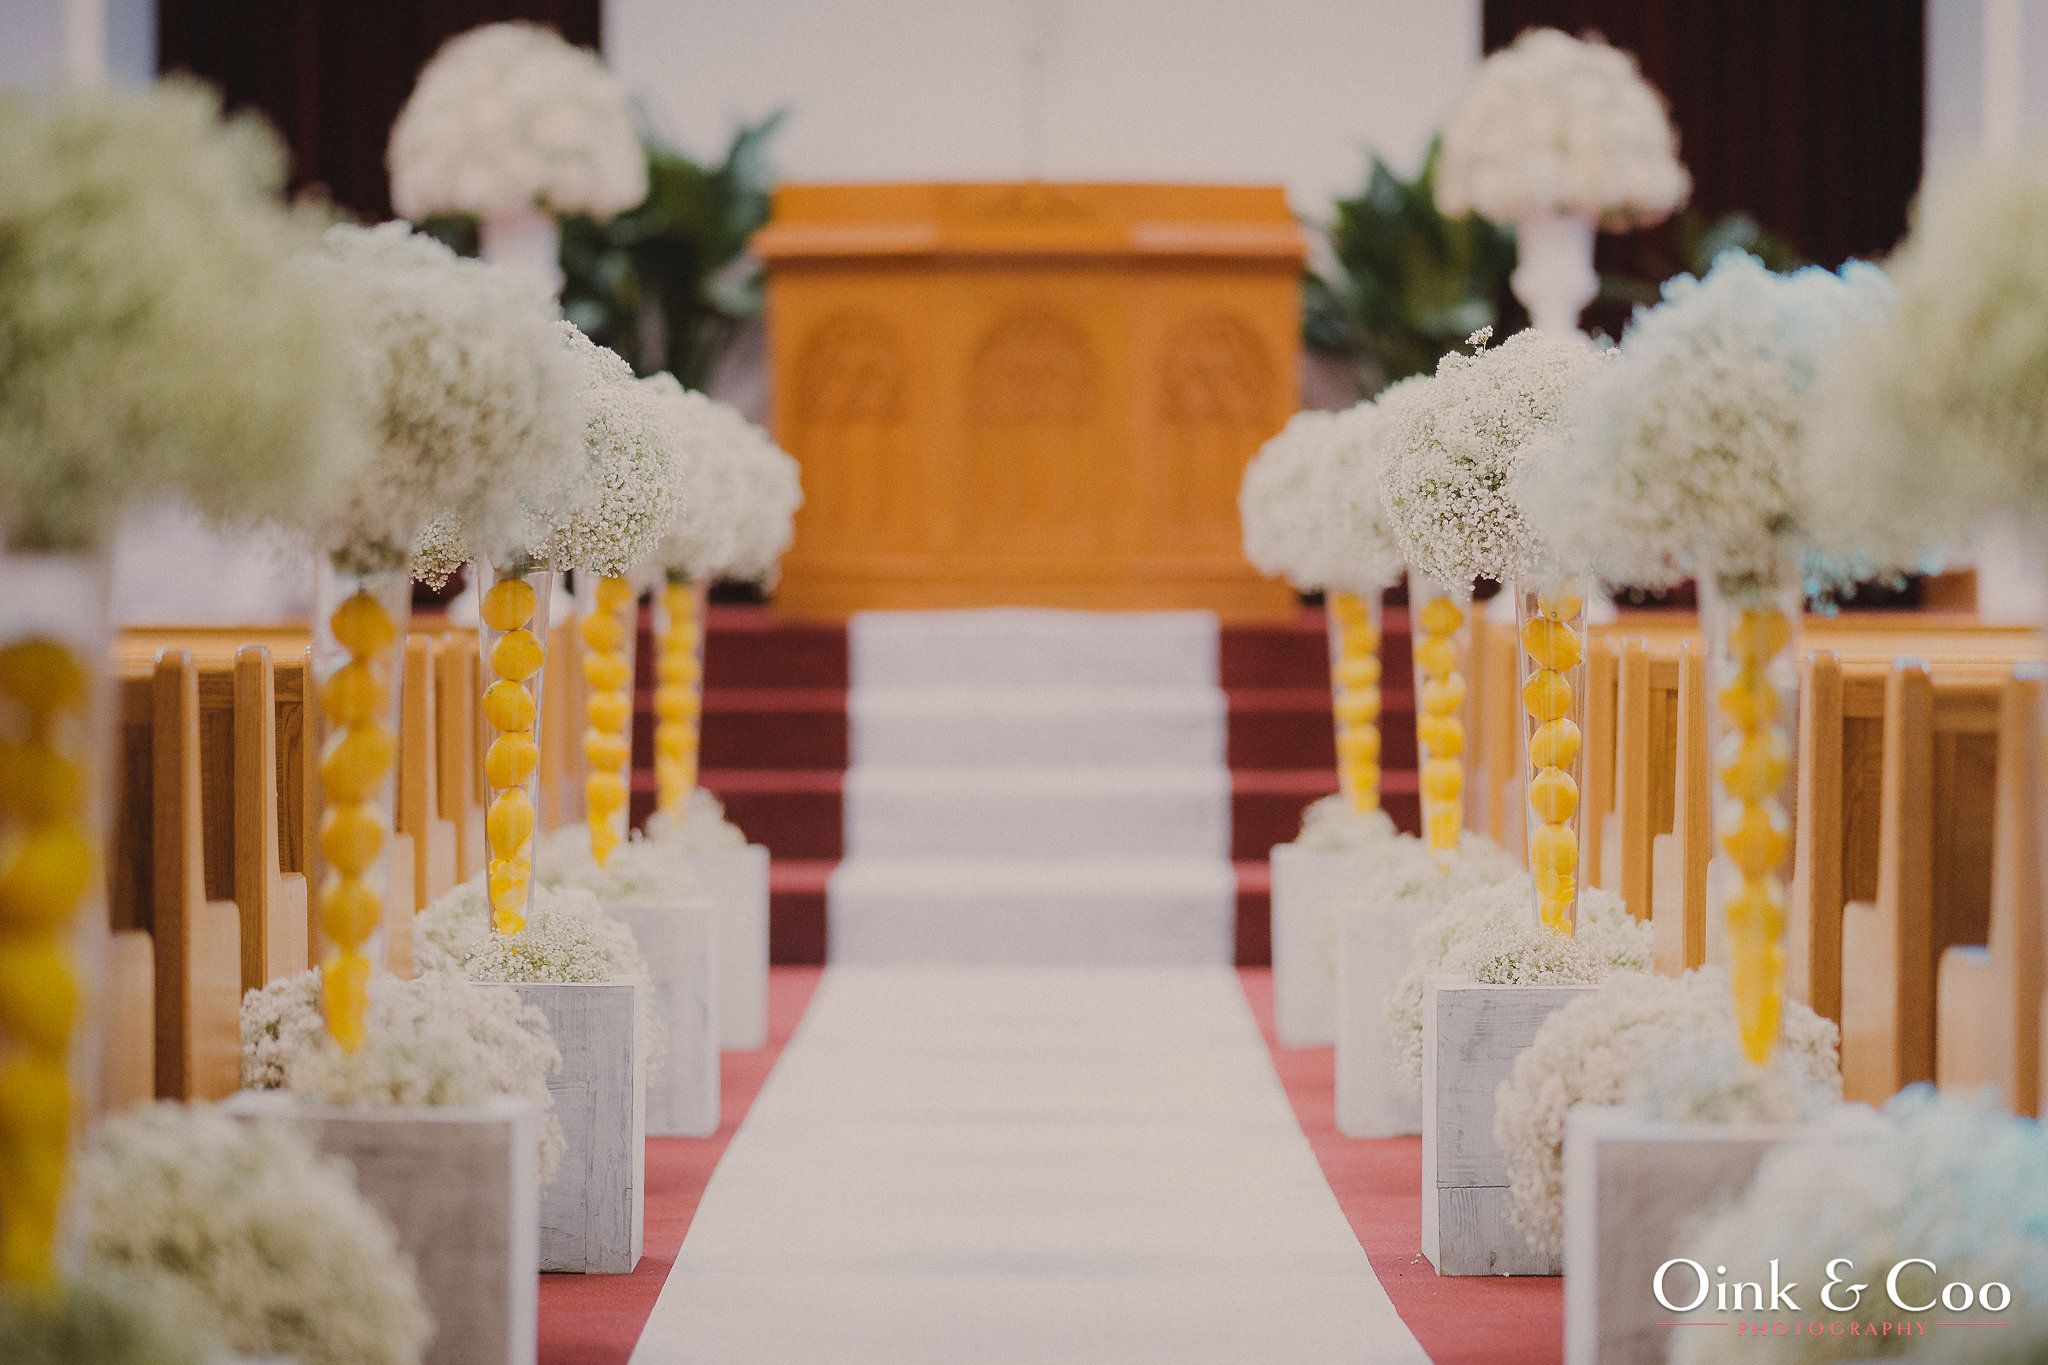 2014 Feb, My Wedding Ceremony Church Decor Lemon, Babys Breathe,